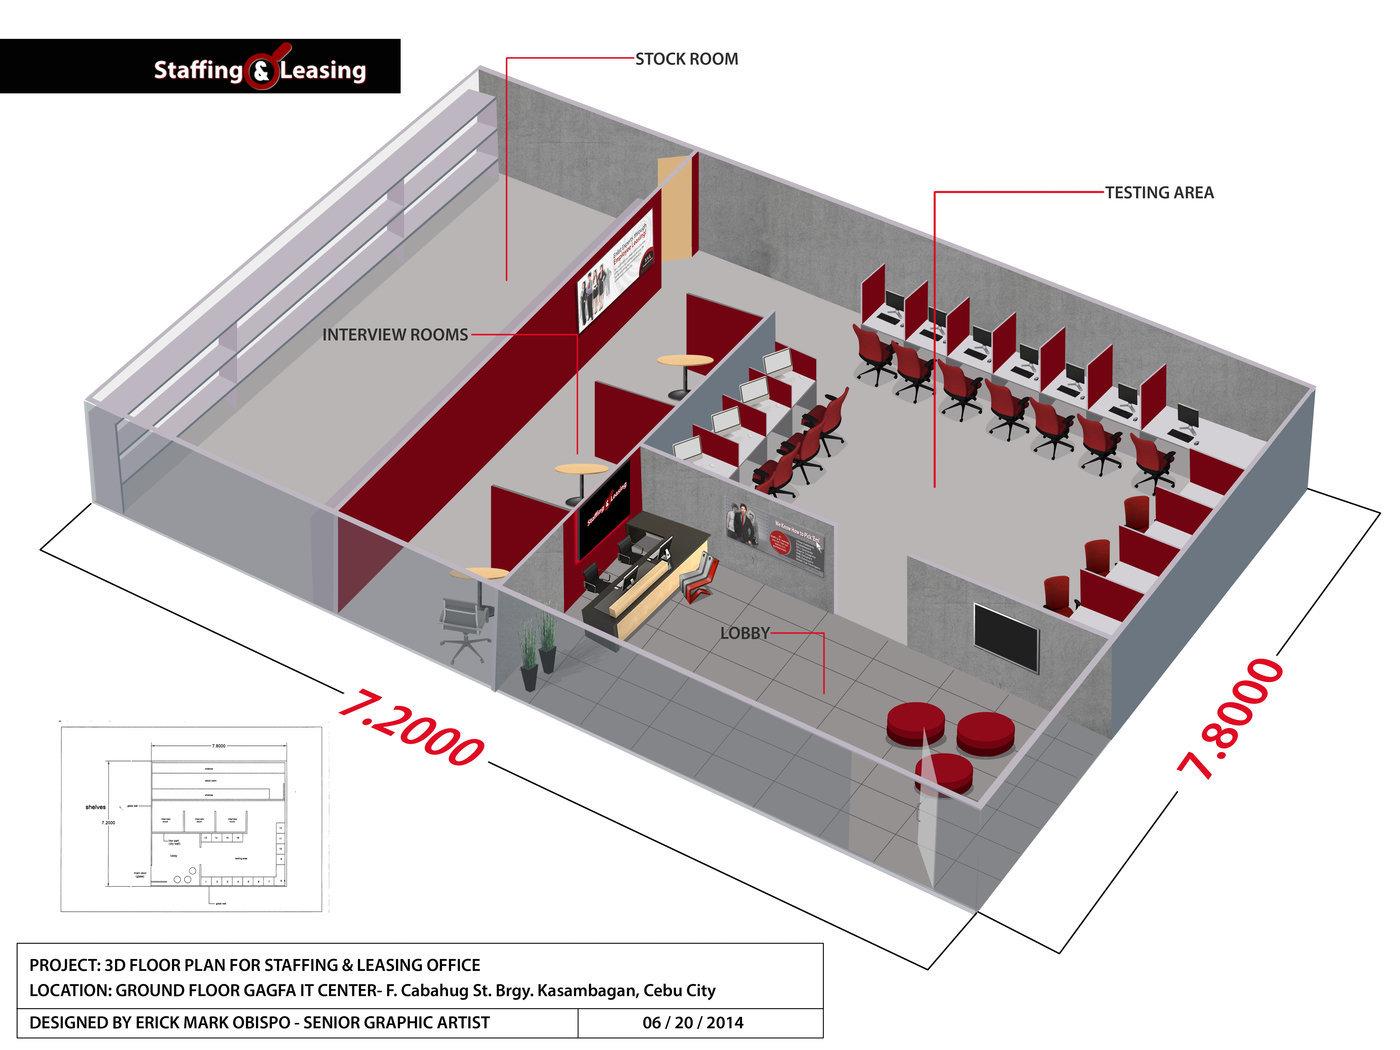 Floor Plan Illustrations By Erick Mark Obispo At Coroflot Com